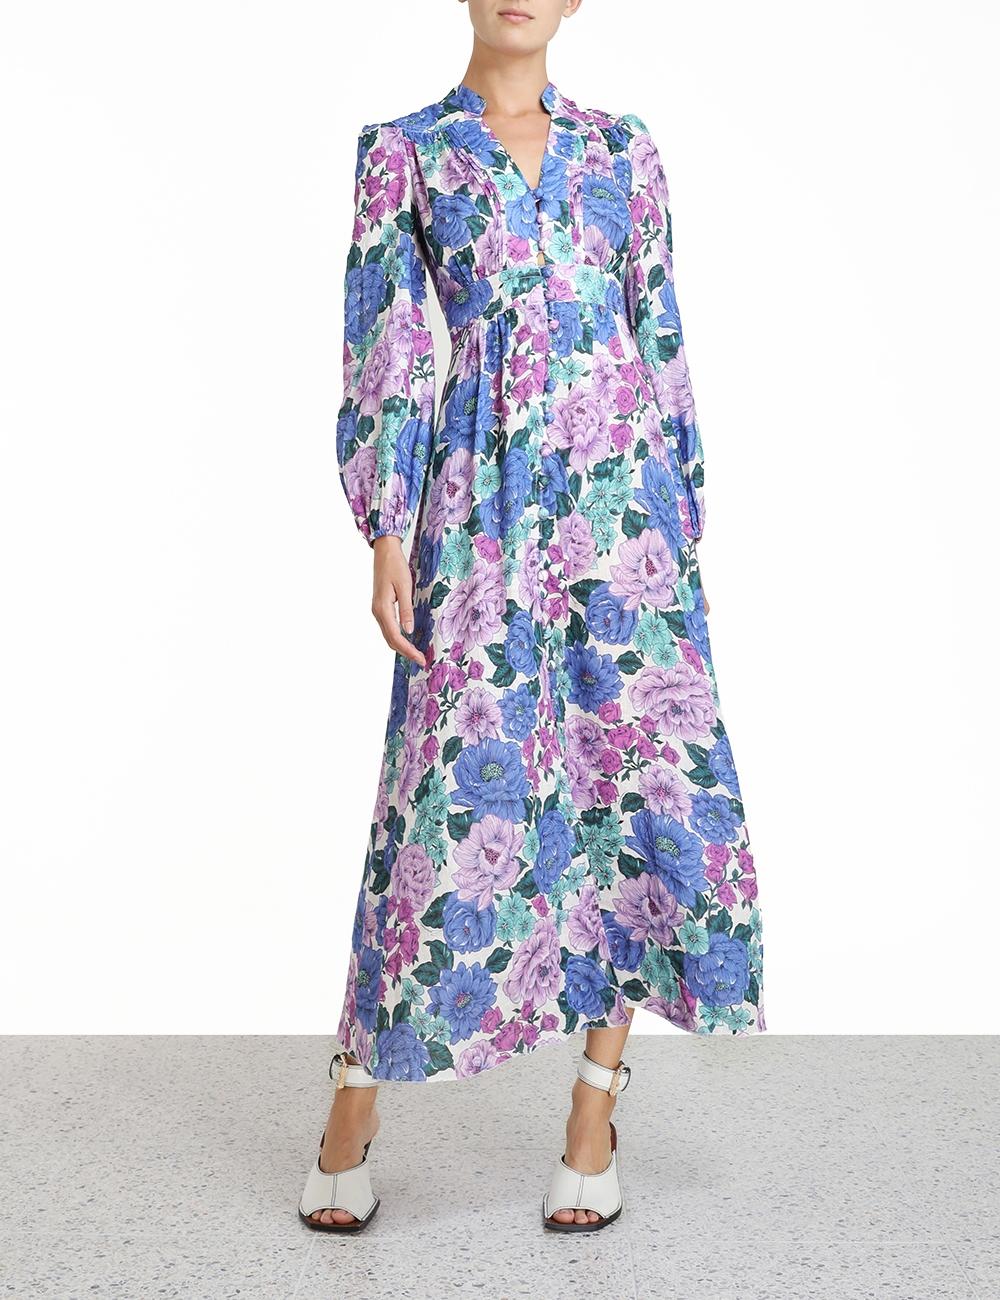 Poppy Plunge Midi Dress